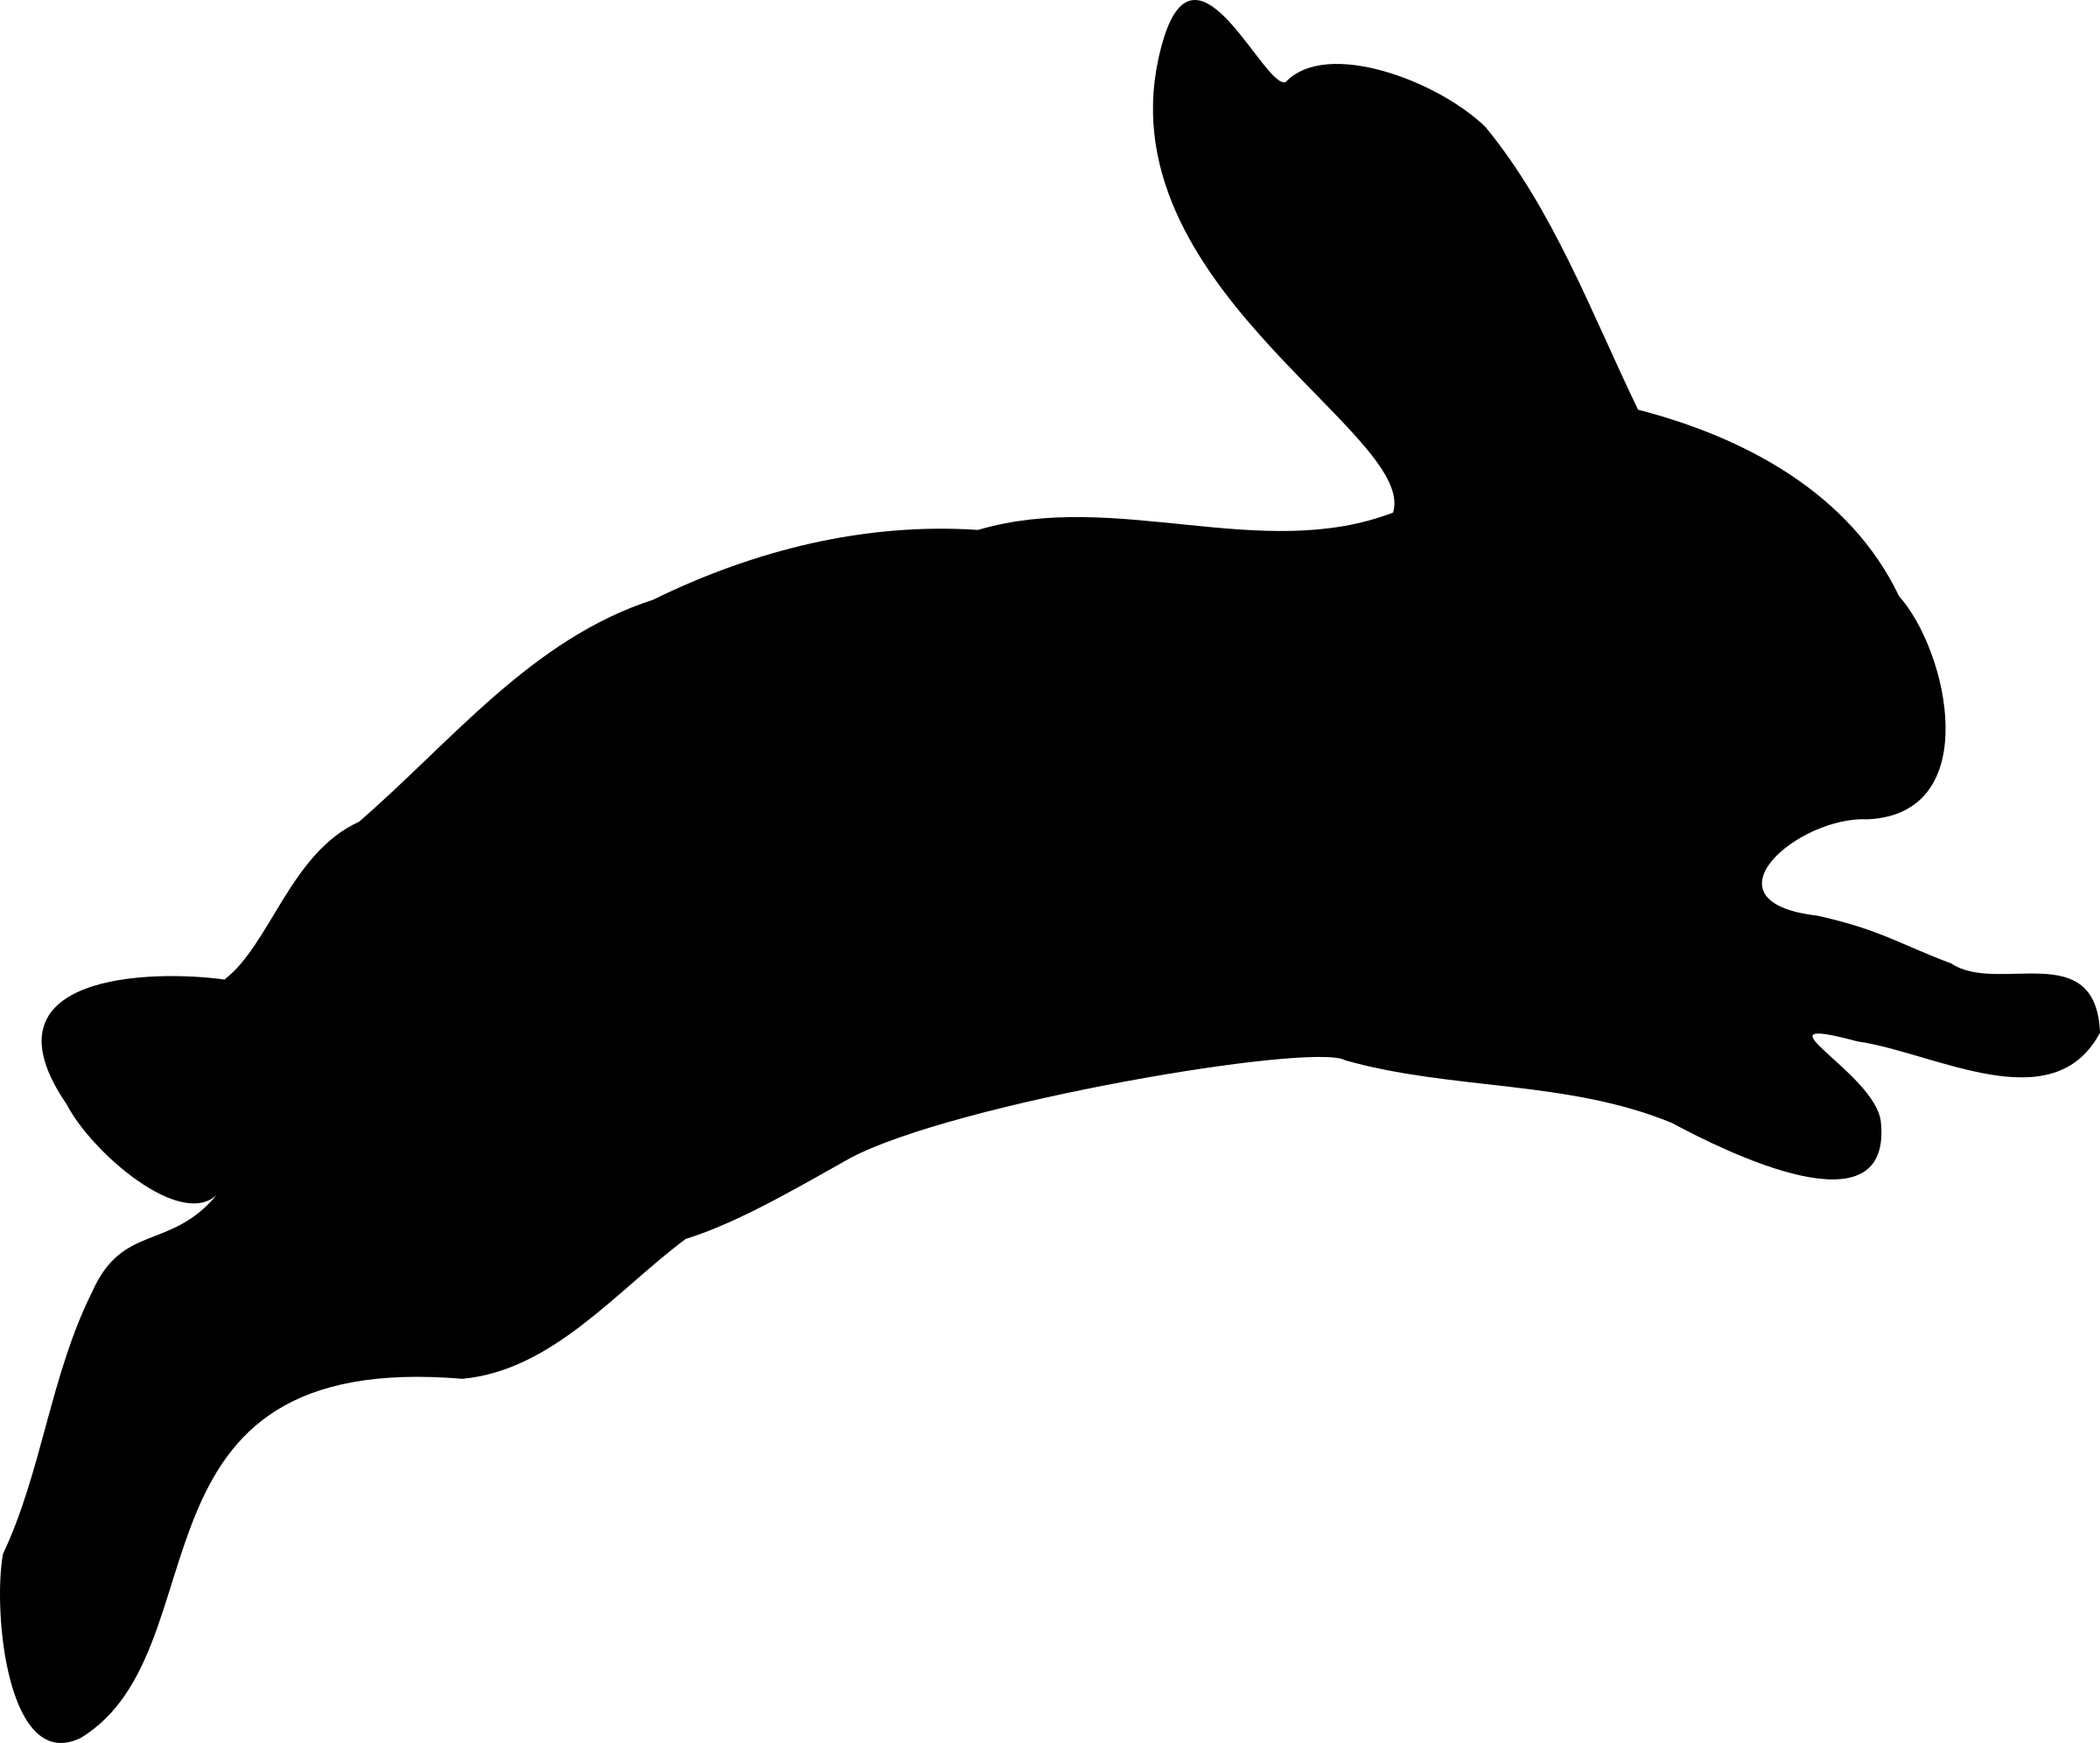 2400x1992 Clipart